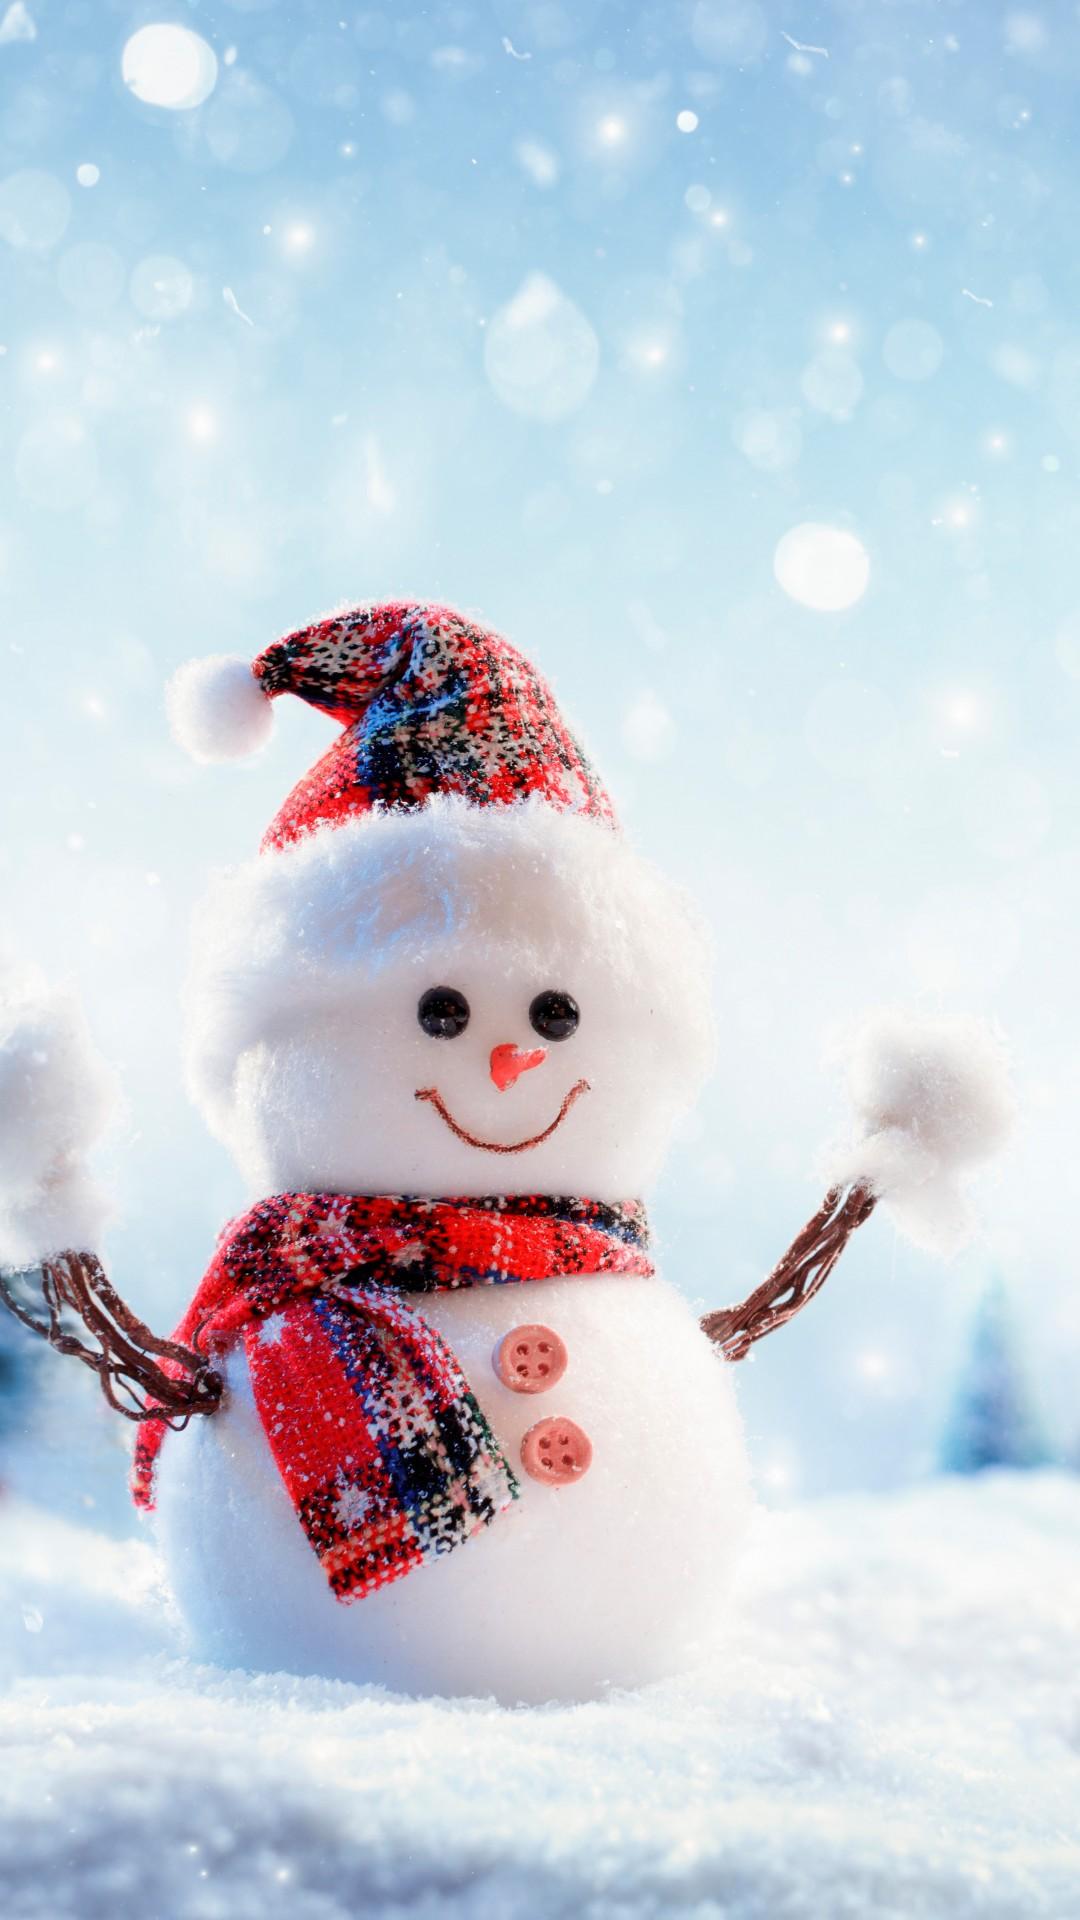 wallpaper christmas new year snow winter snowman 8k